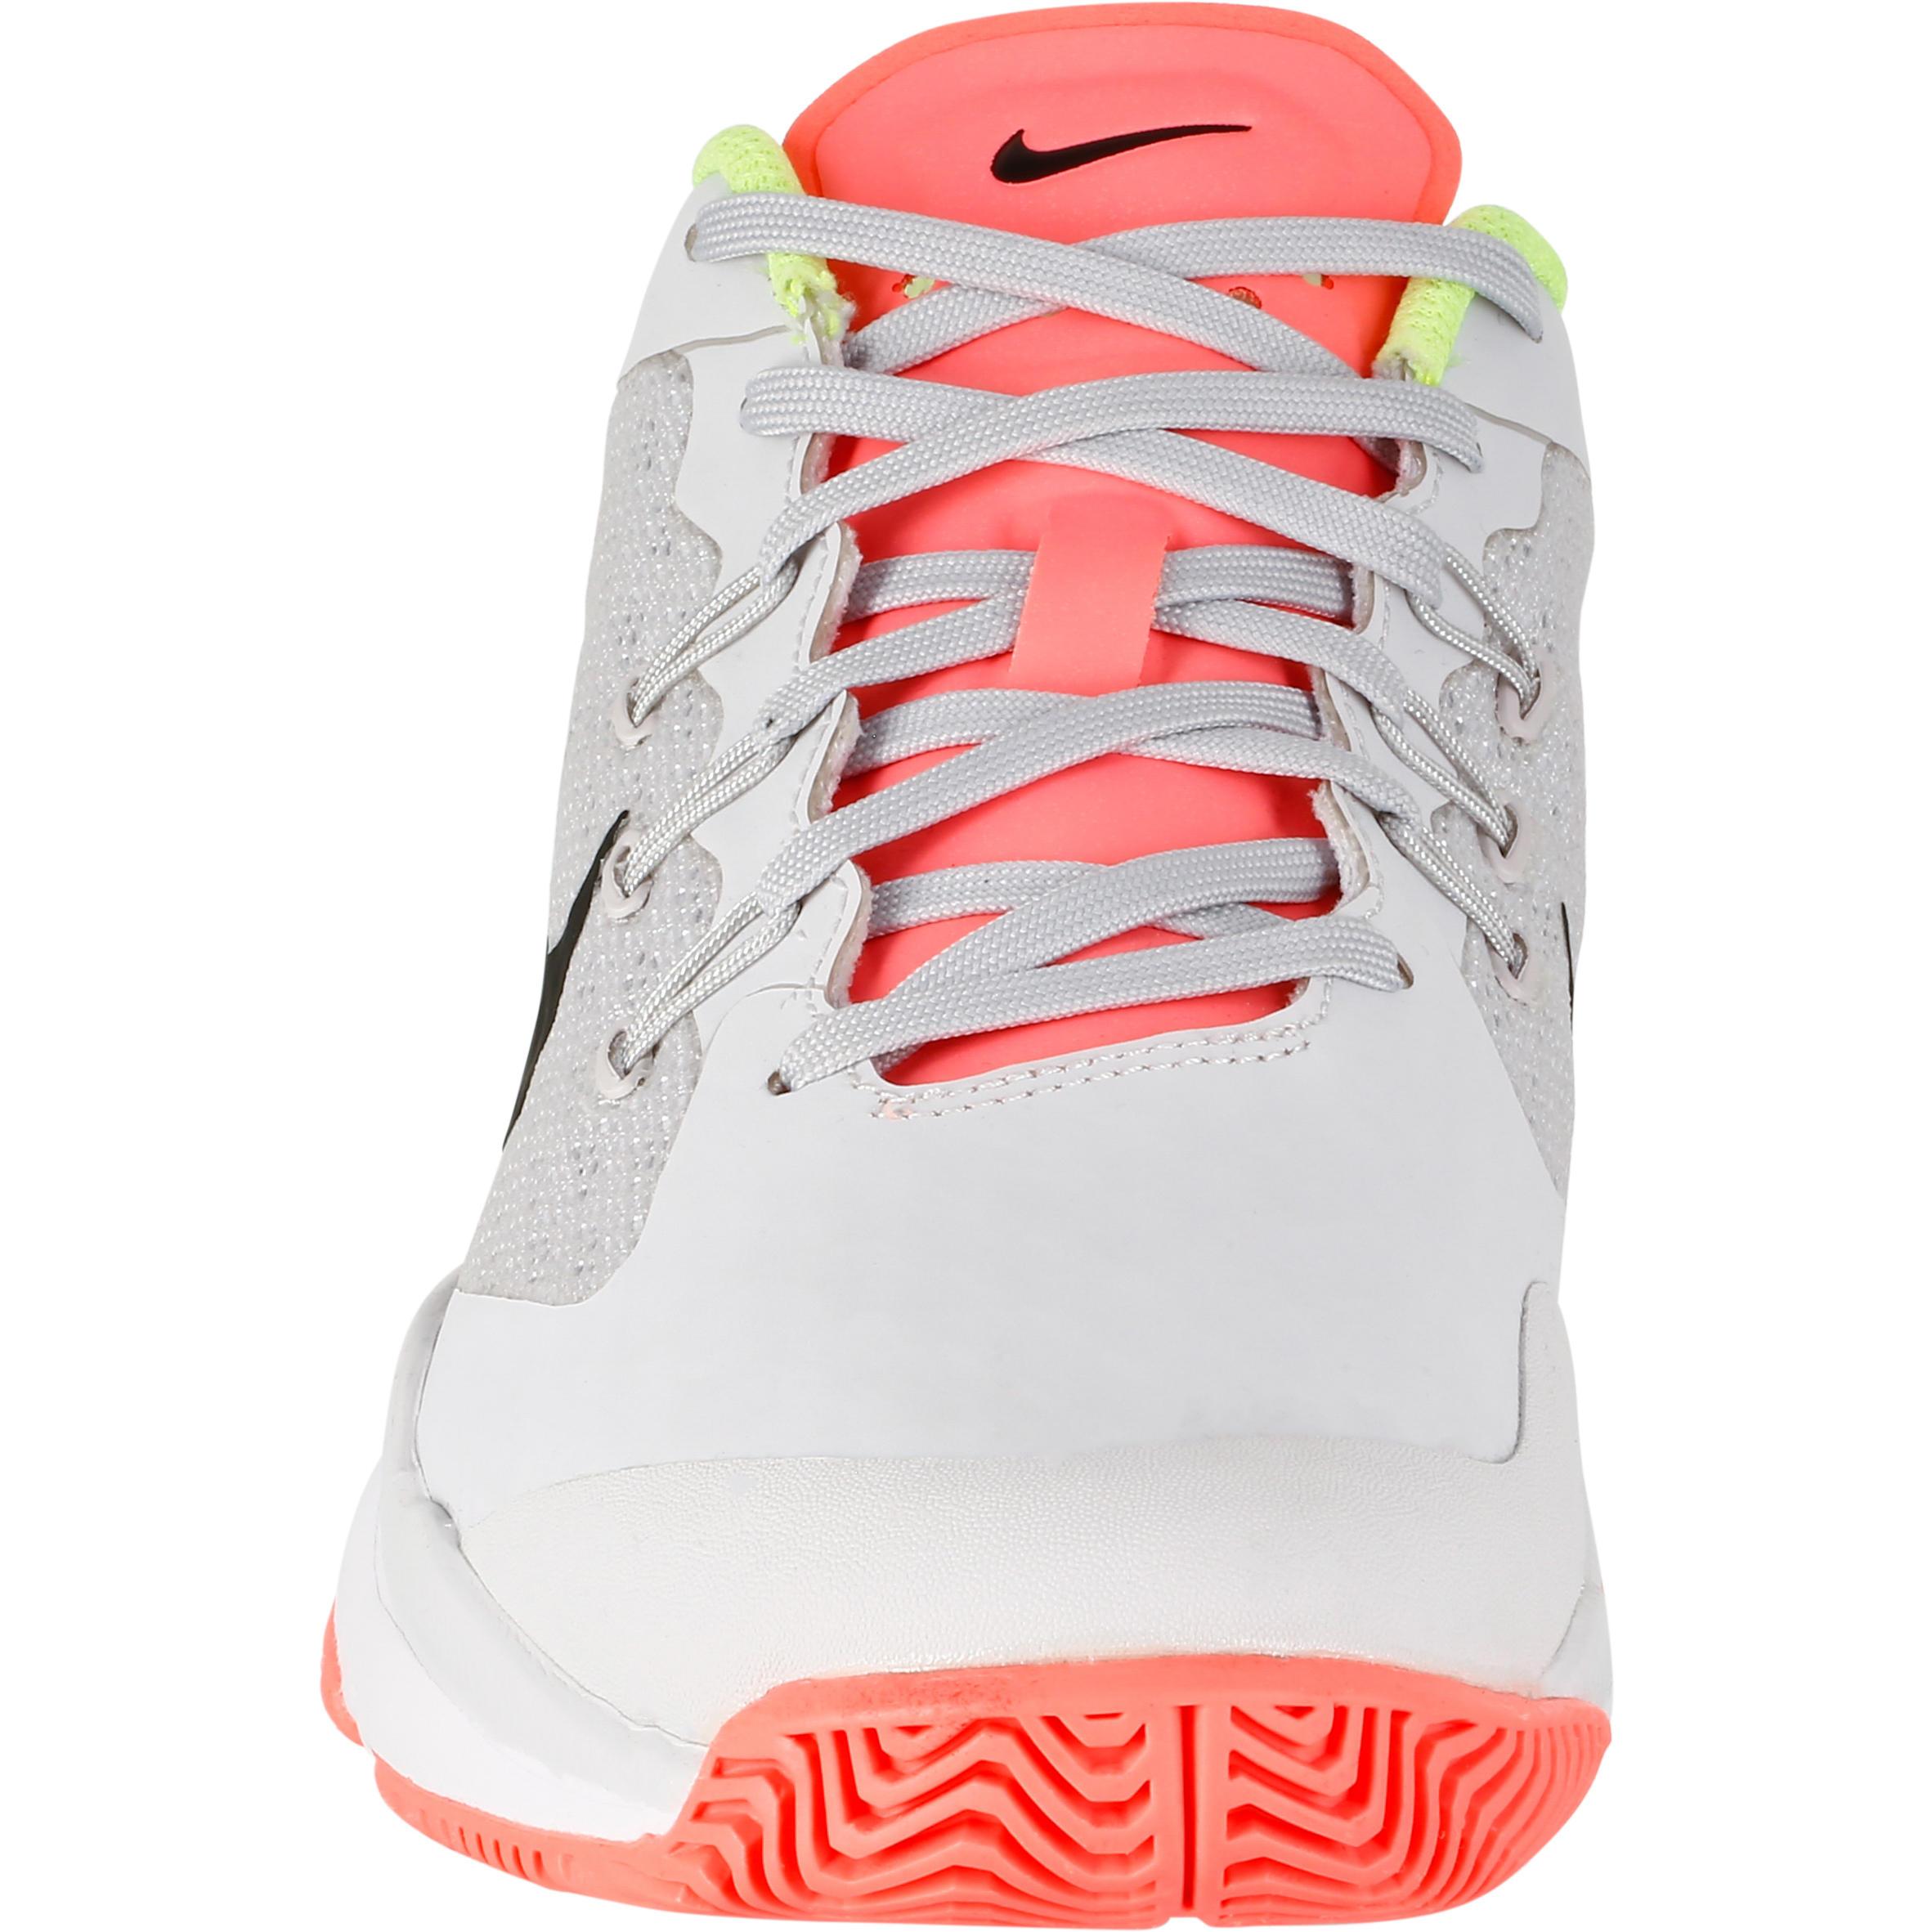 De Chaussures Volt Gris Femme Ultra Tennis Zoom Eb2e9IYHDW